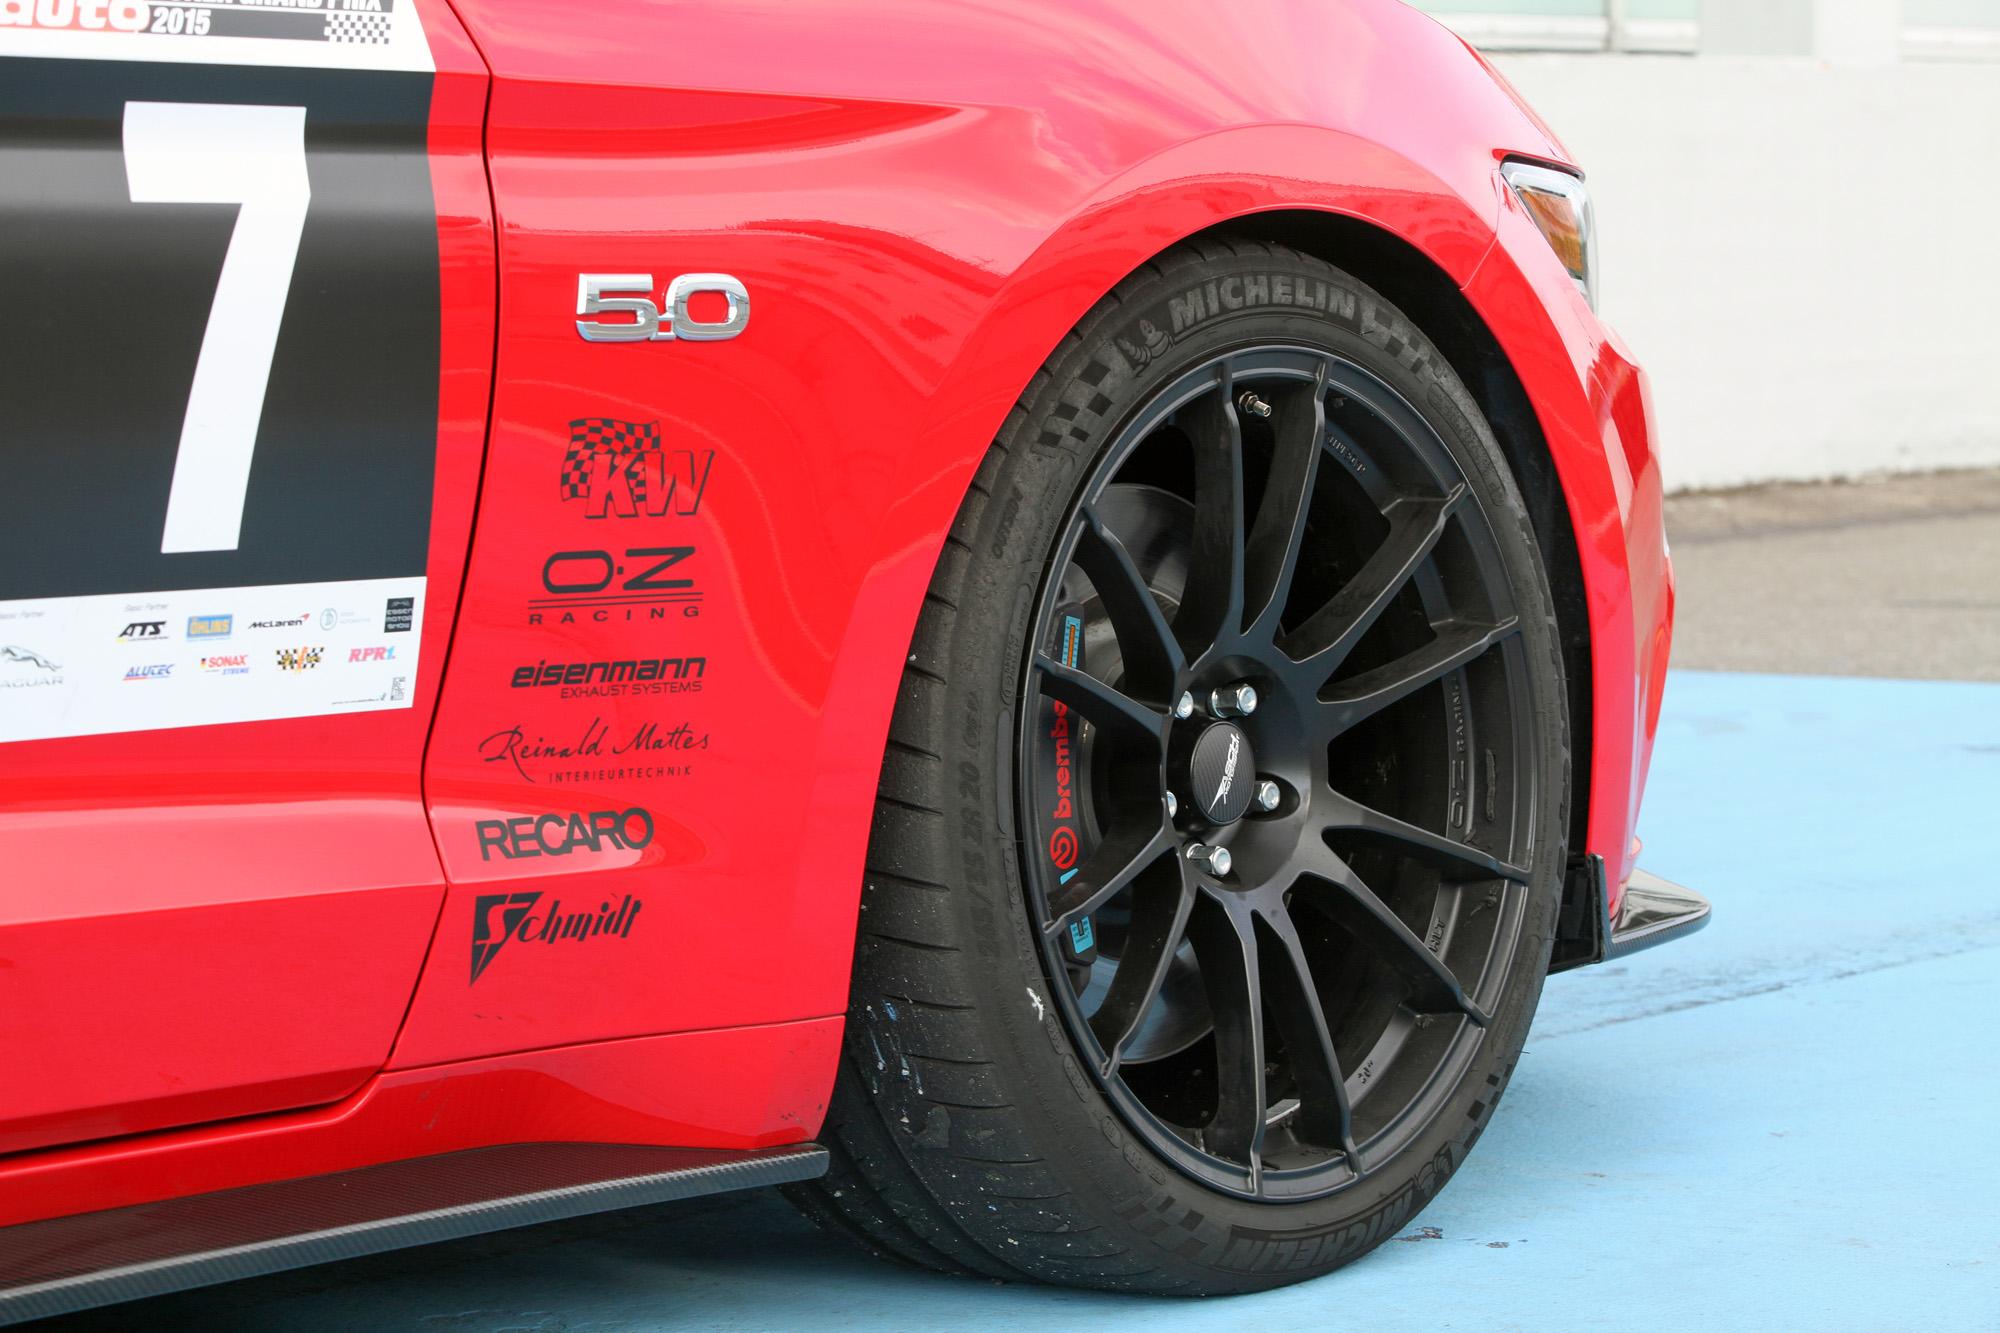 Wem der zwangsbeatmete Ecoboost nicht genügt, greift einfach zum V8-getriebenen Ford Mustang GT.